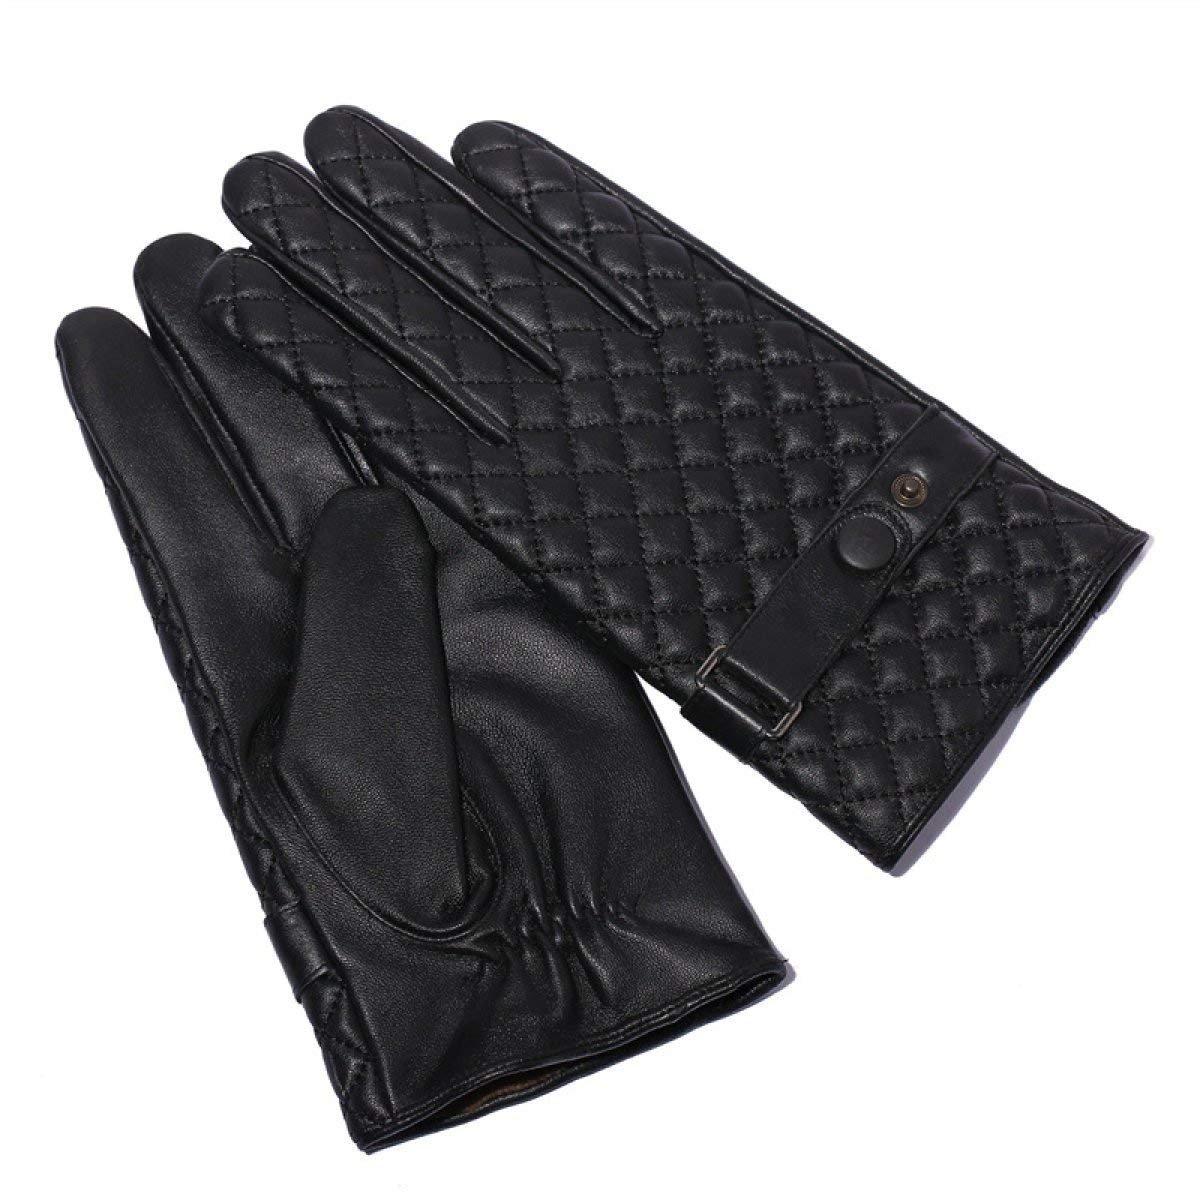 CWJ Men Touch Screen Gloves Diamond-Shaped Lattice Drive Thick Warm,Black,Large